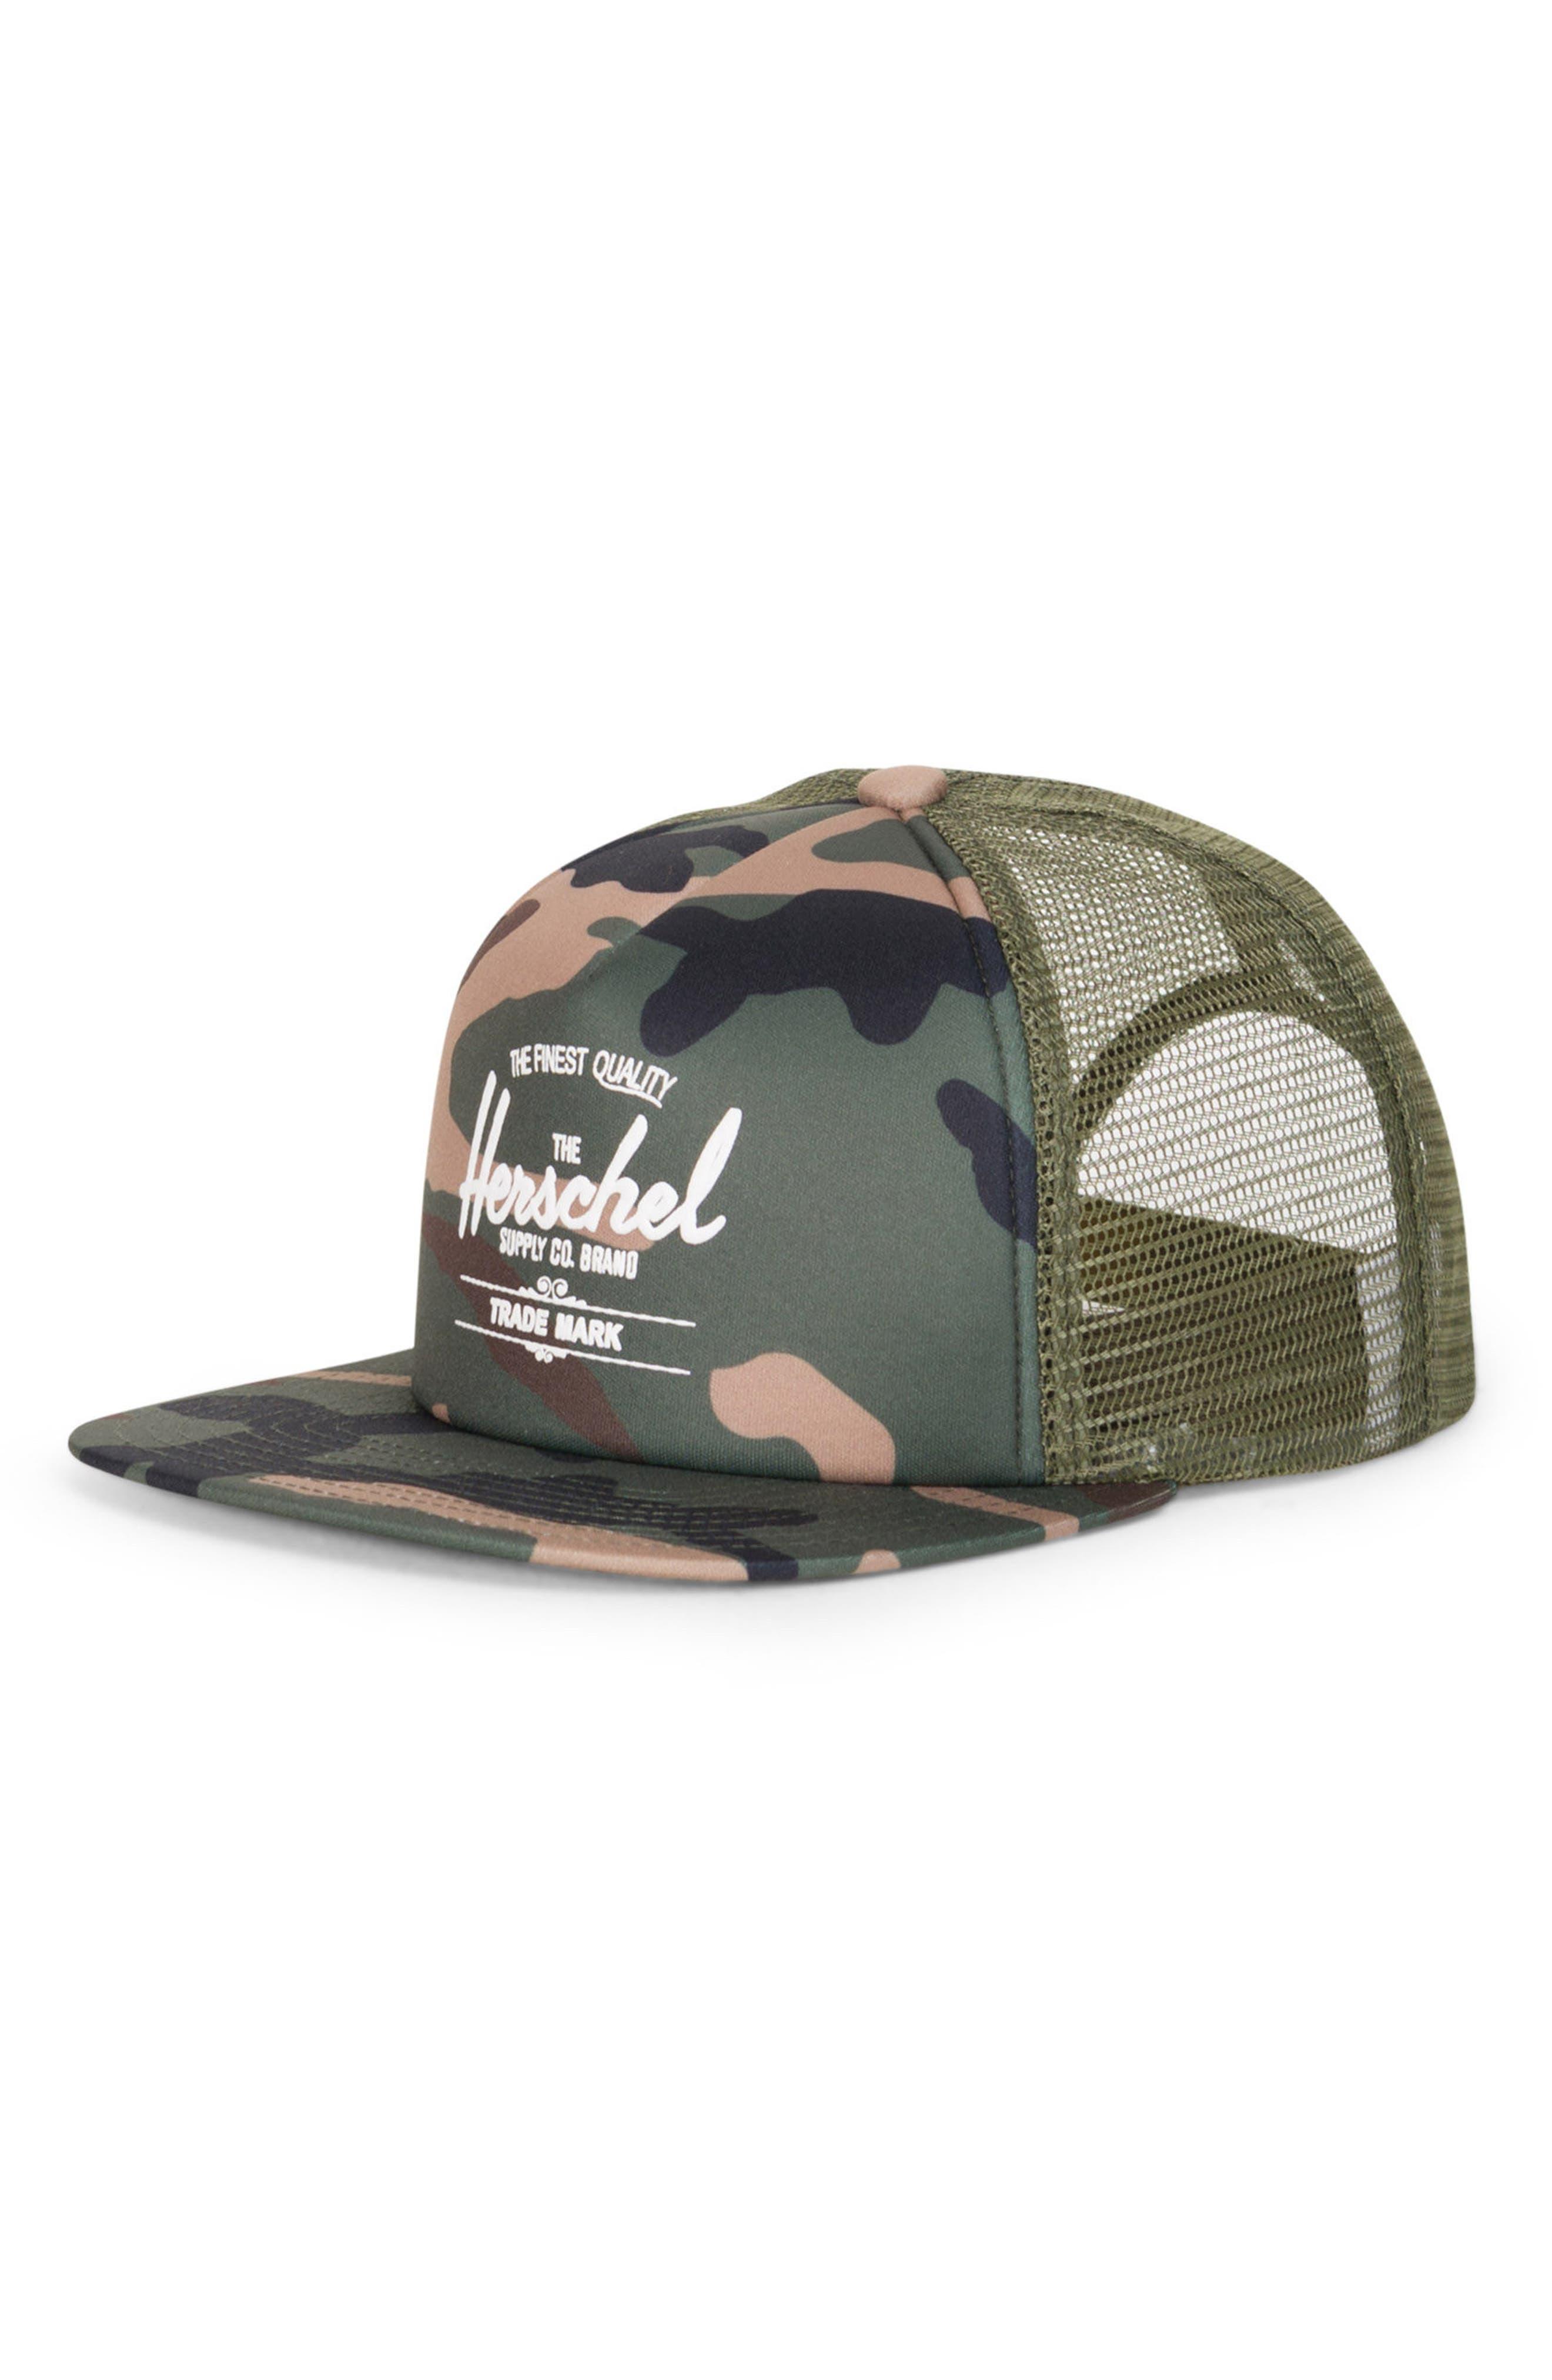 d95696dda21 Hats Herschel Backpacks